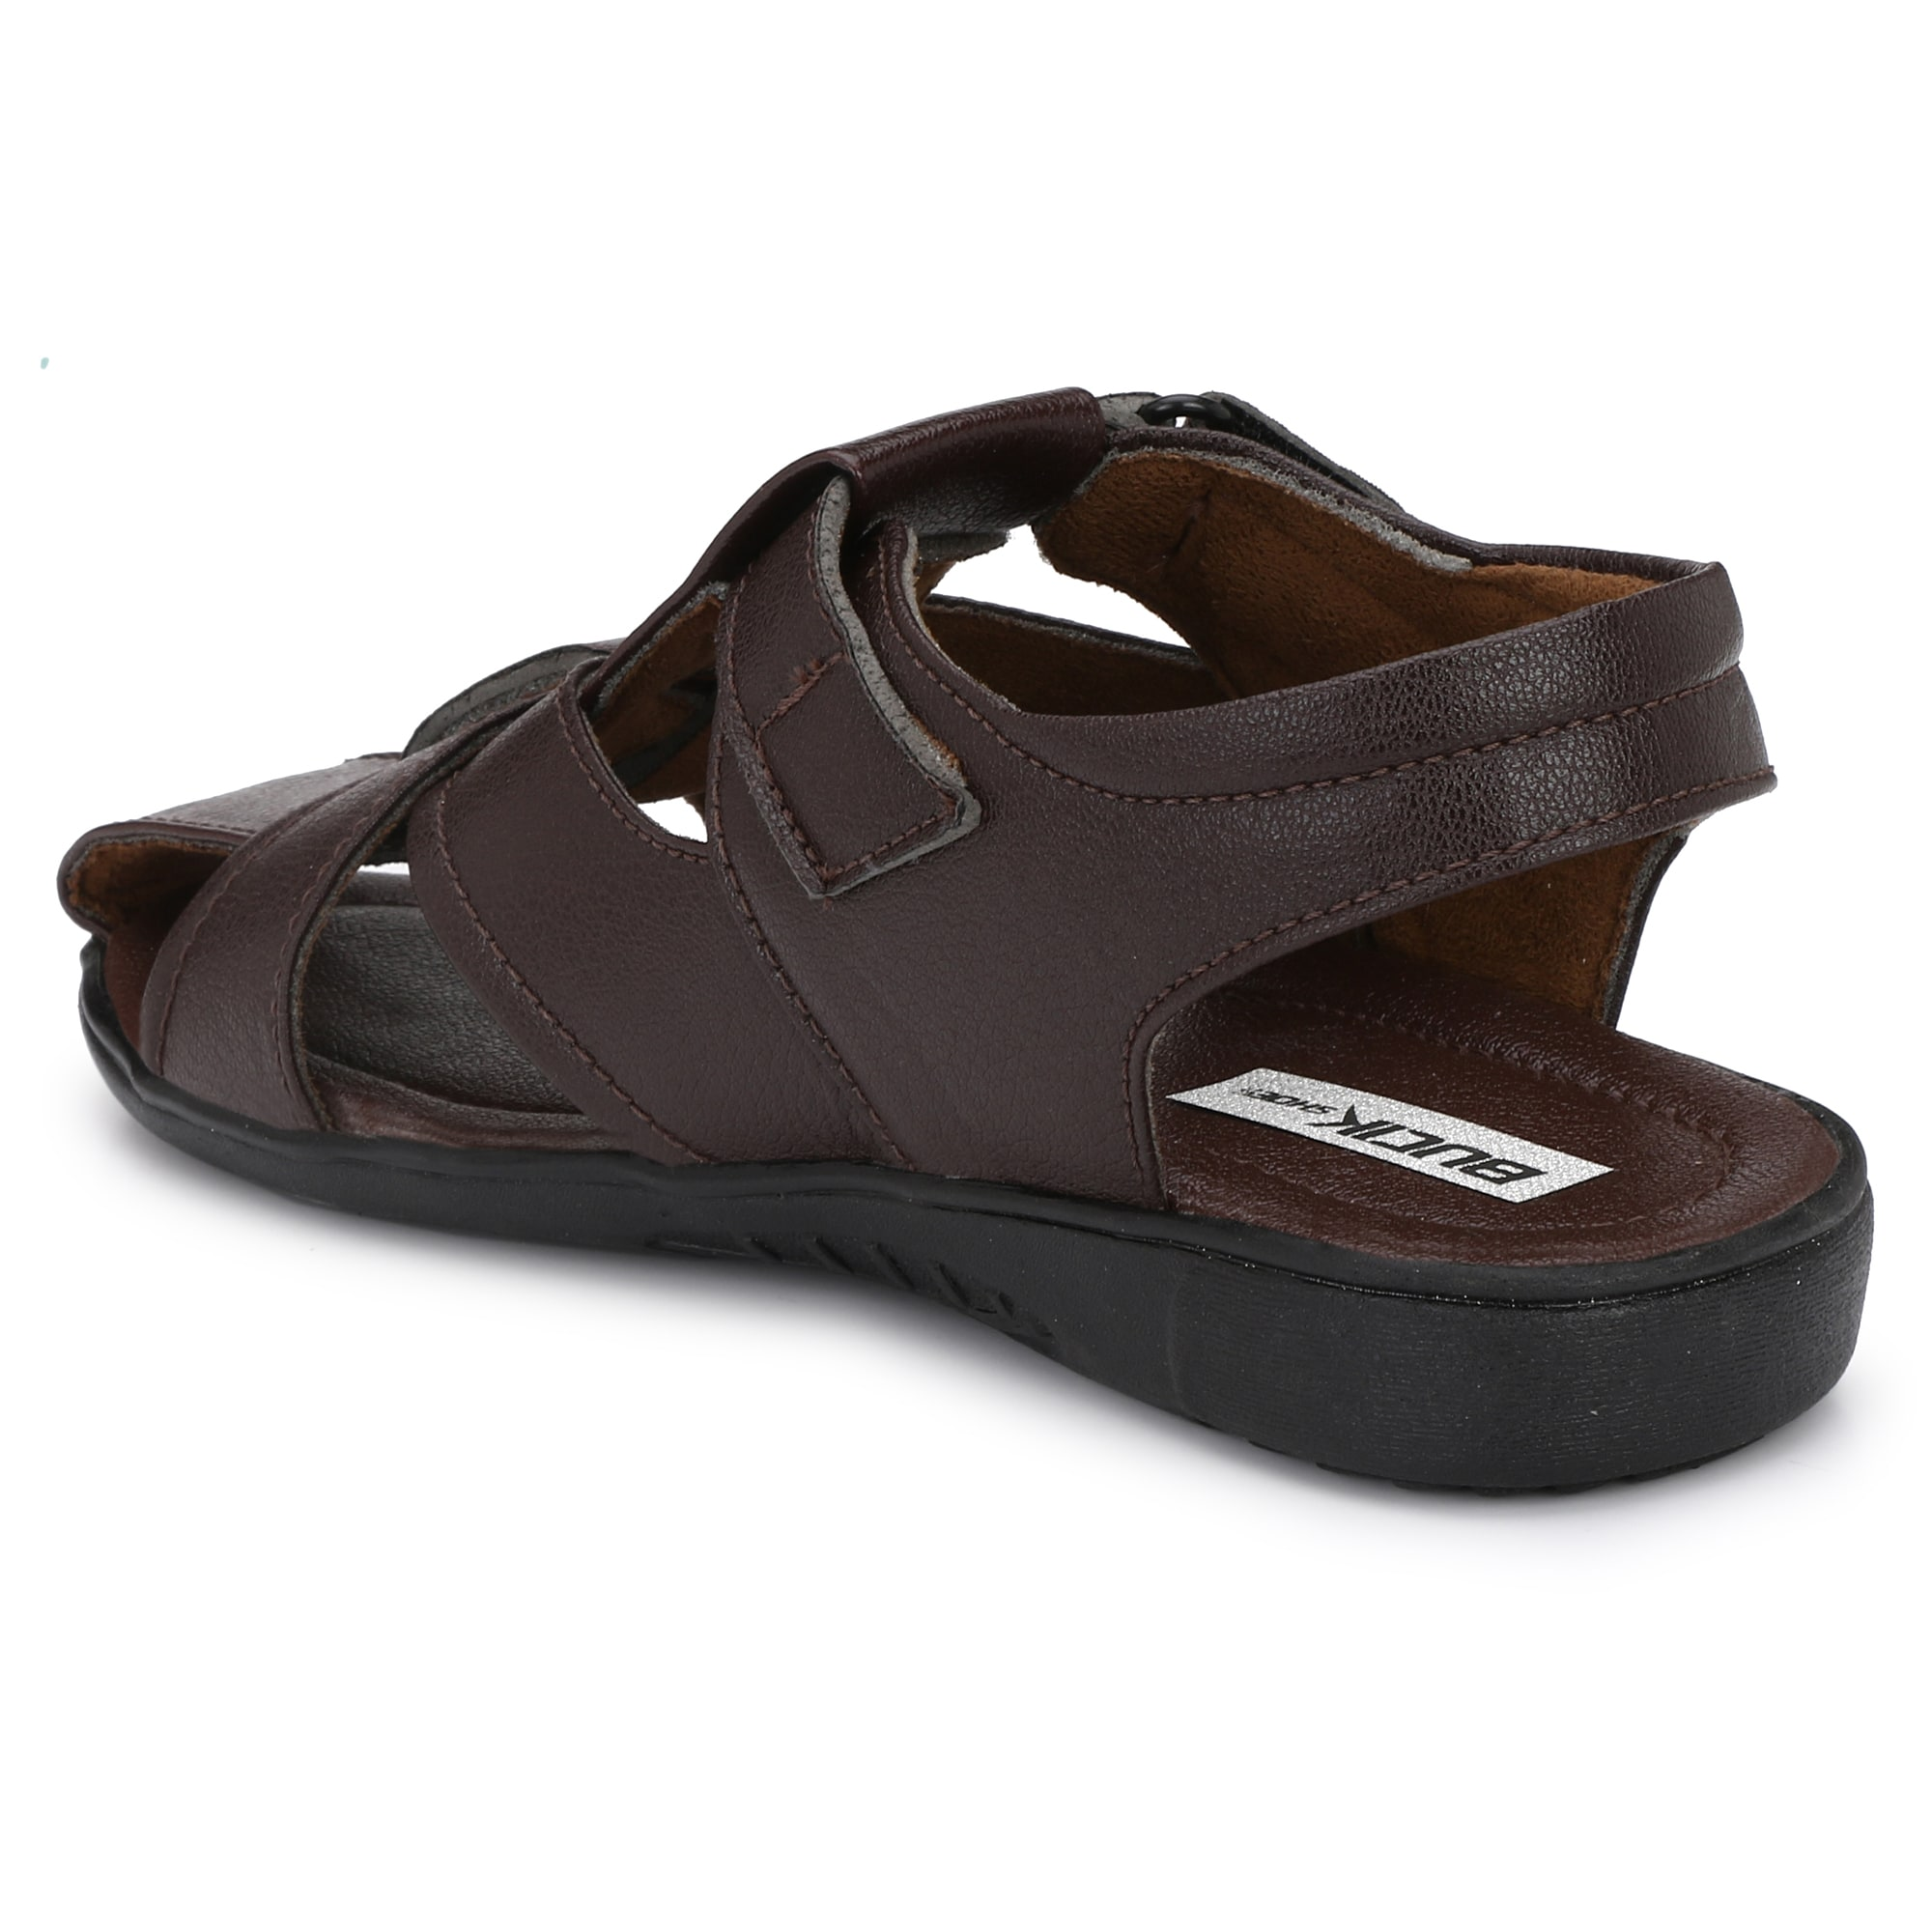 BUCIK Men's BROWN Synthetic Leather Casual Sandal BCK1020-BROWN (Brown,6-10,8 PAIR)